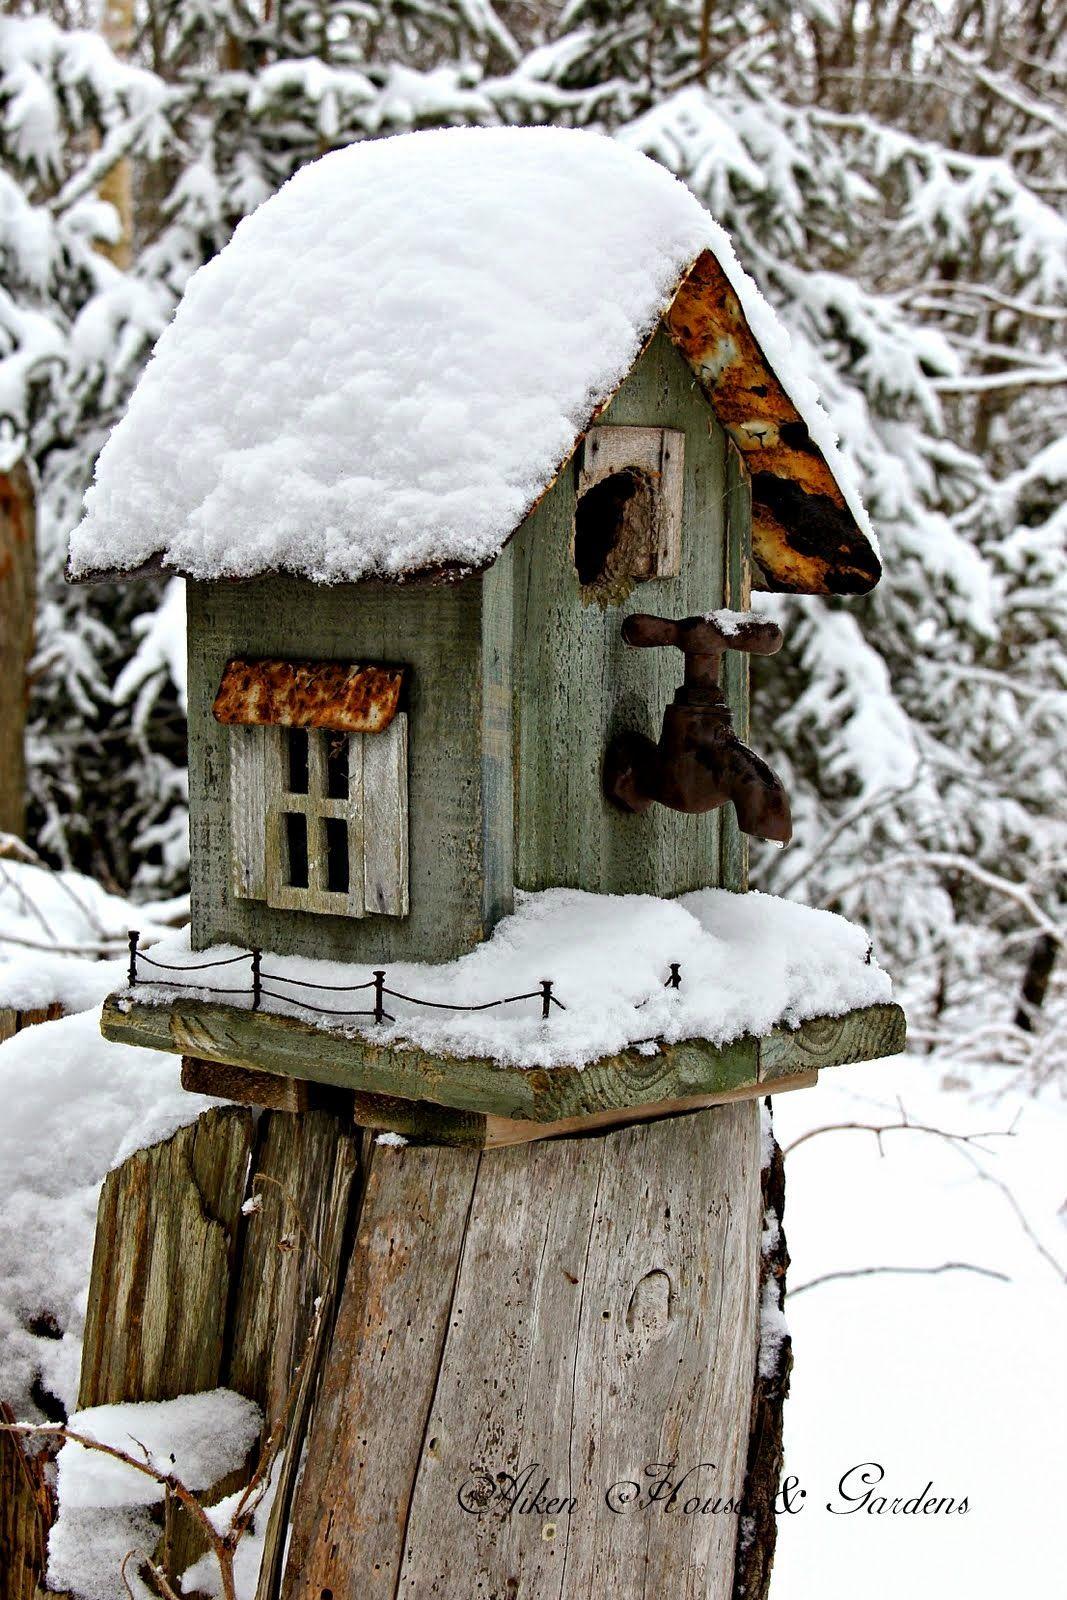 Aiken House & Gardens: Our Winter Garden #wintergardening